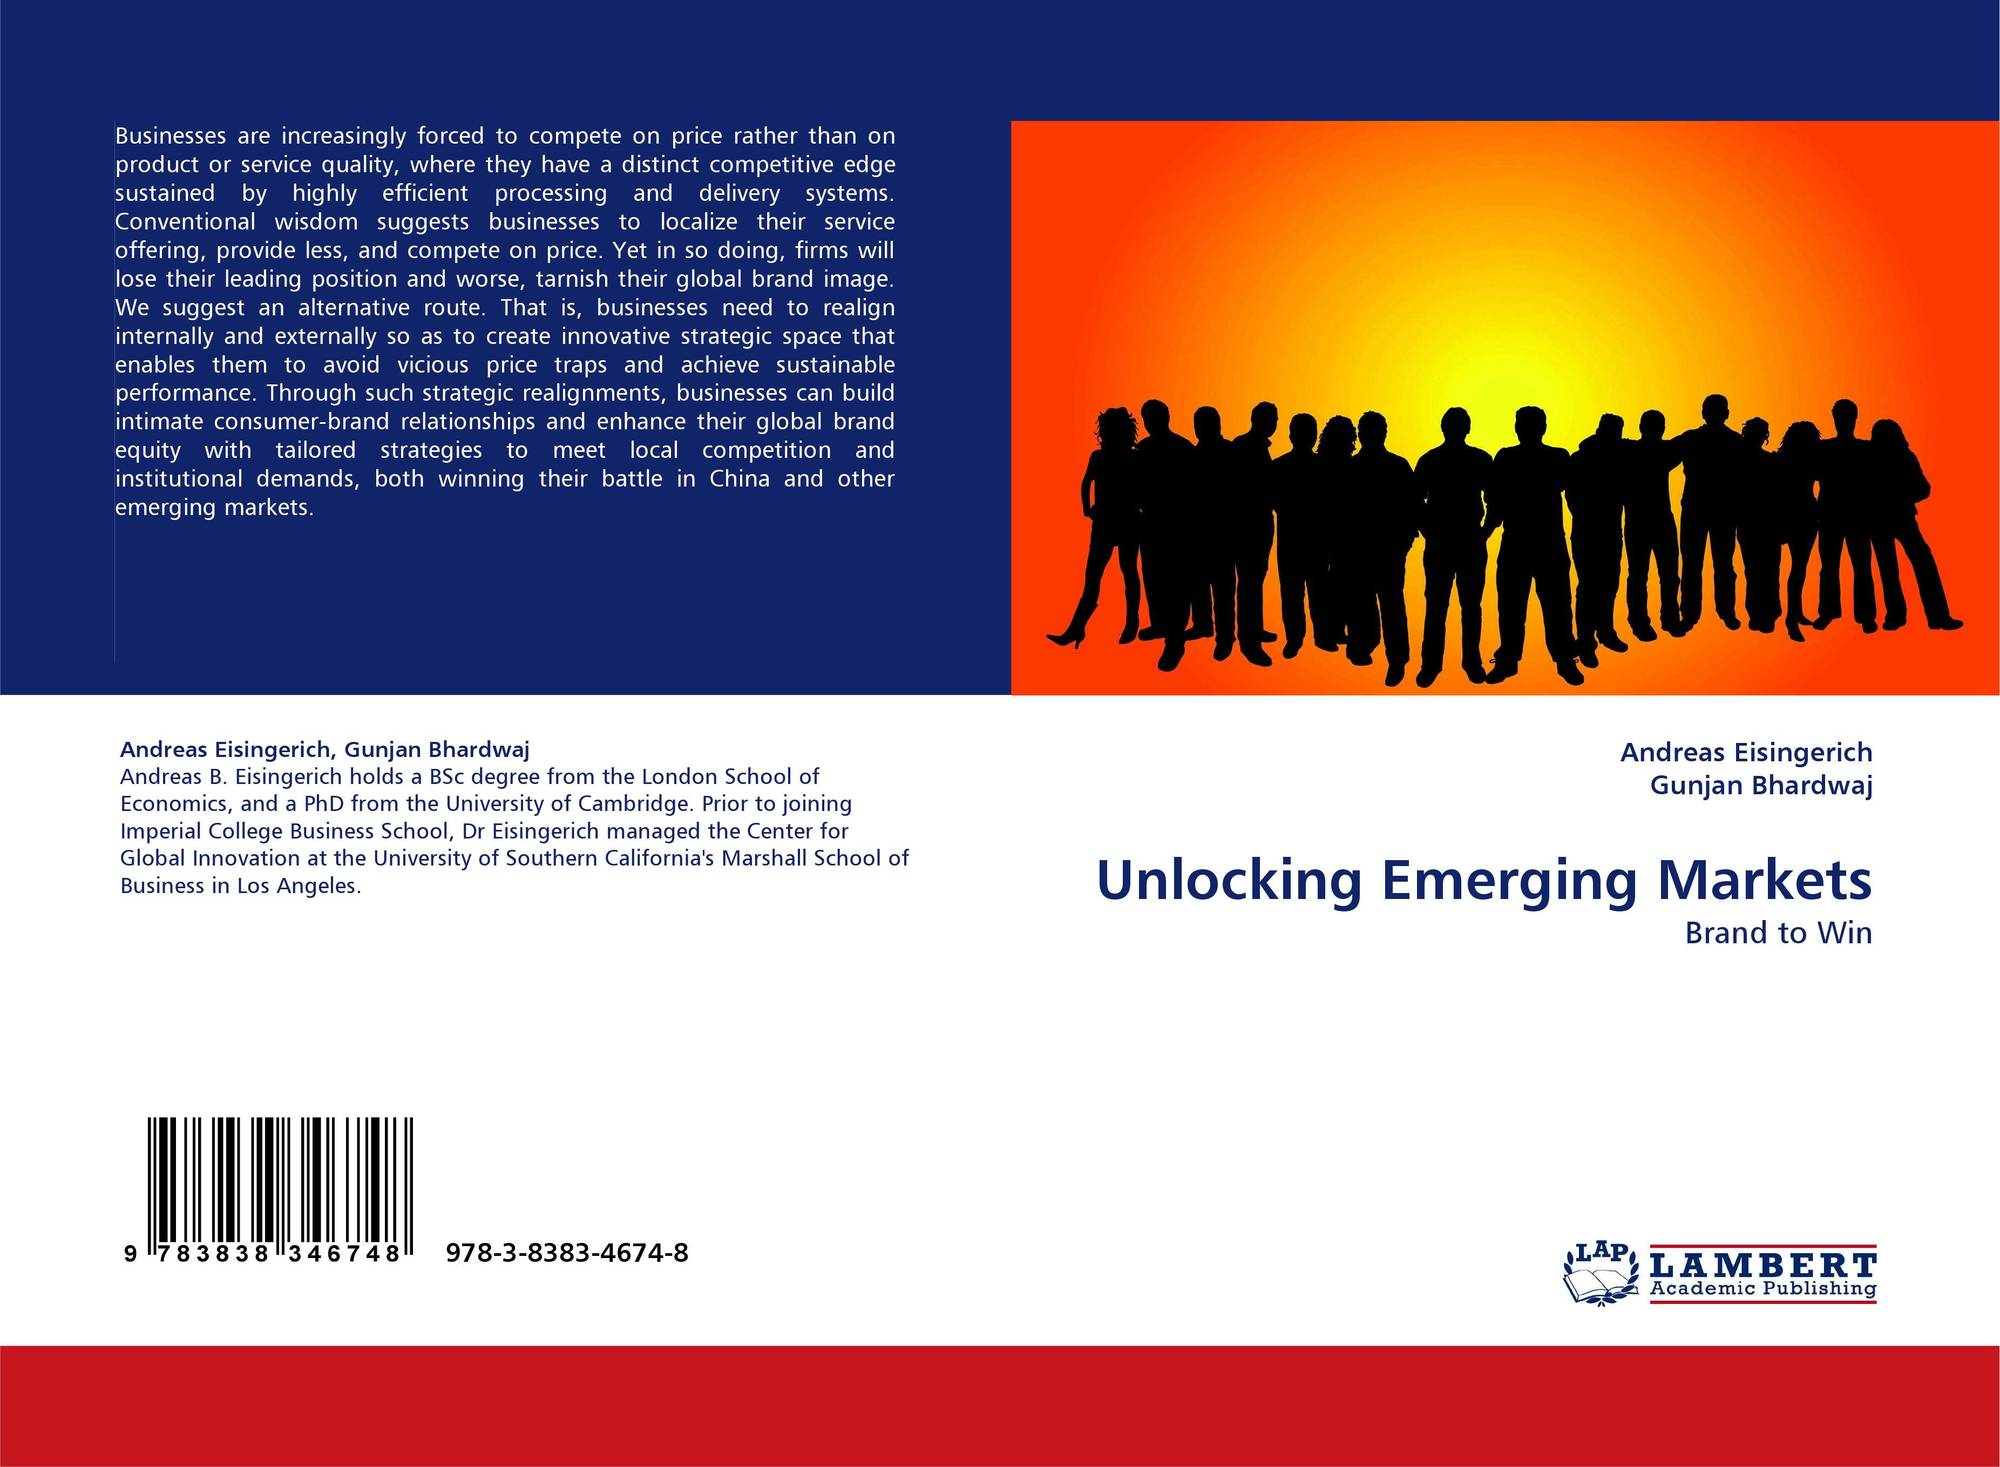 unlocking emerging markets